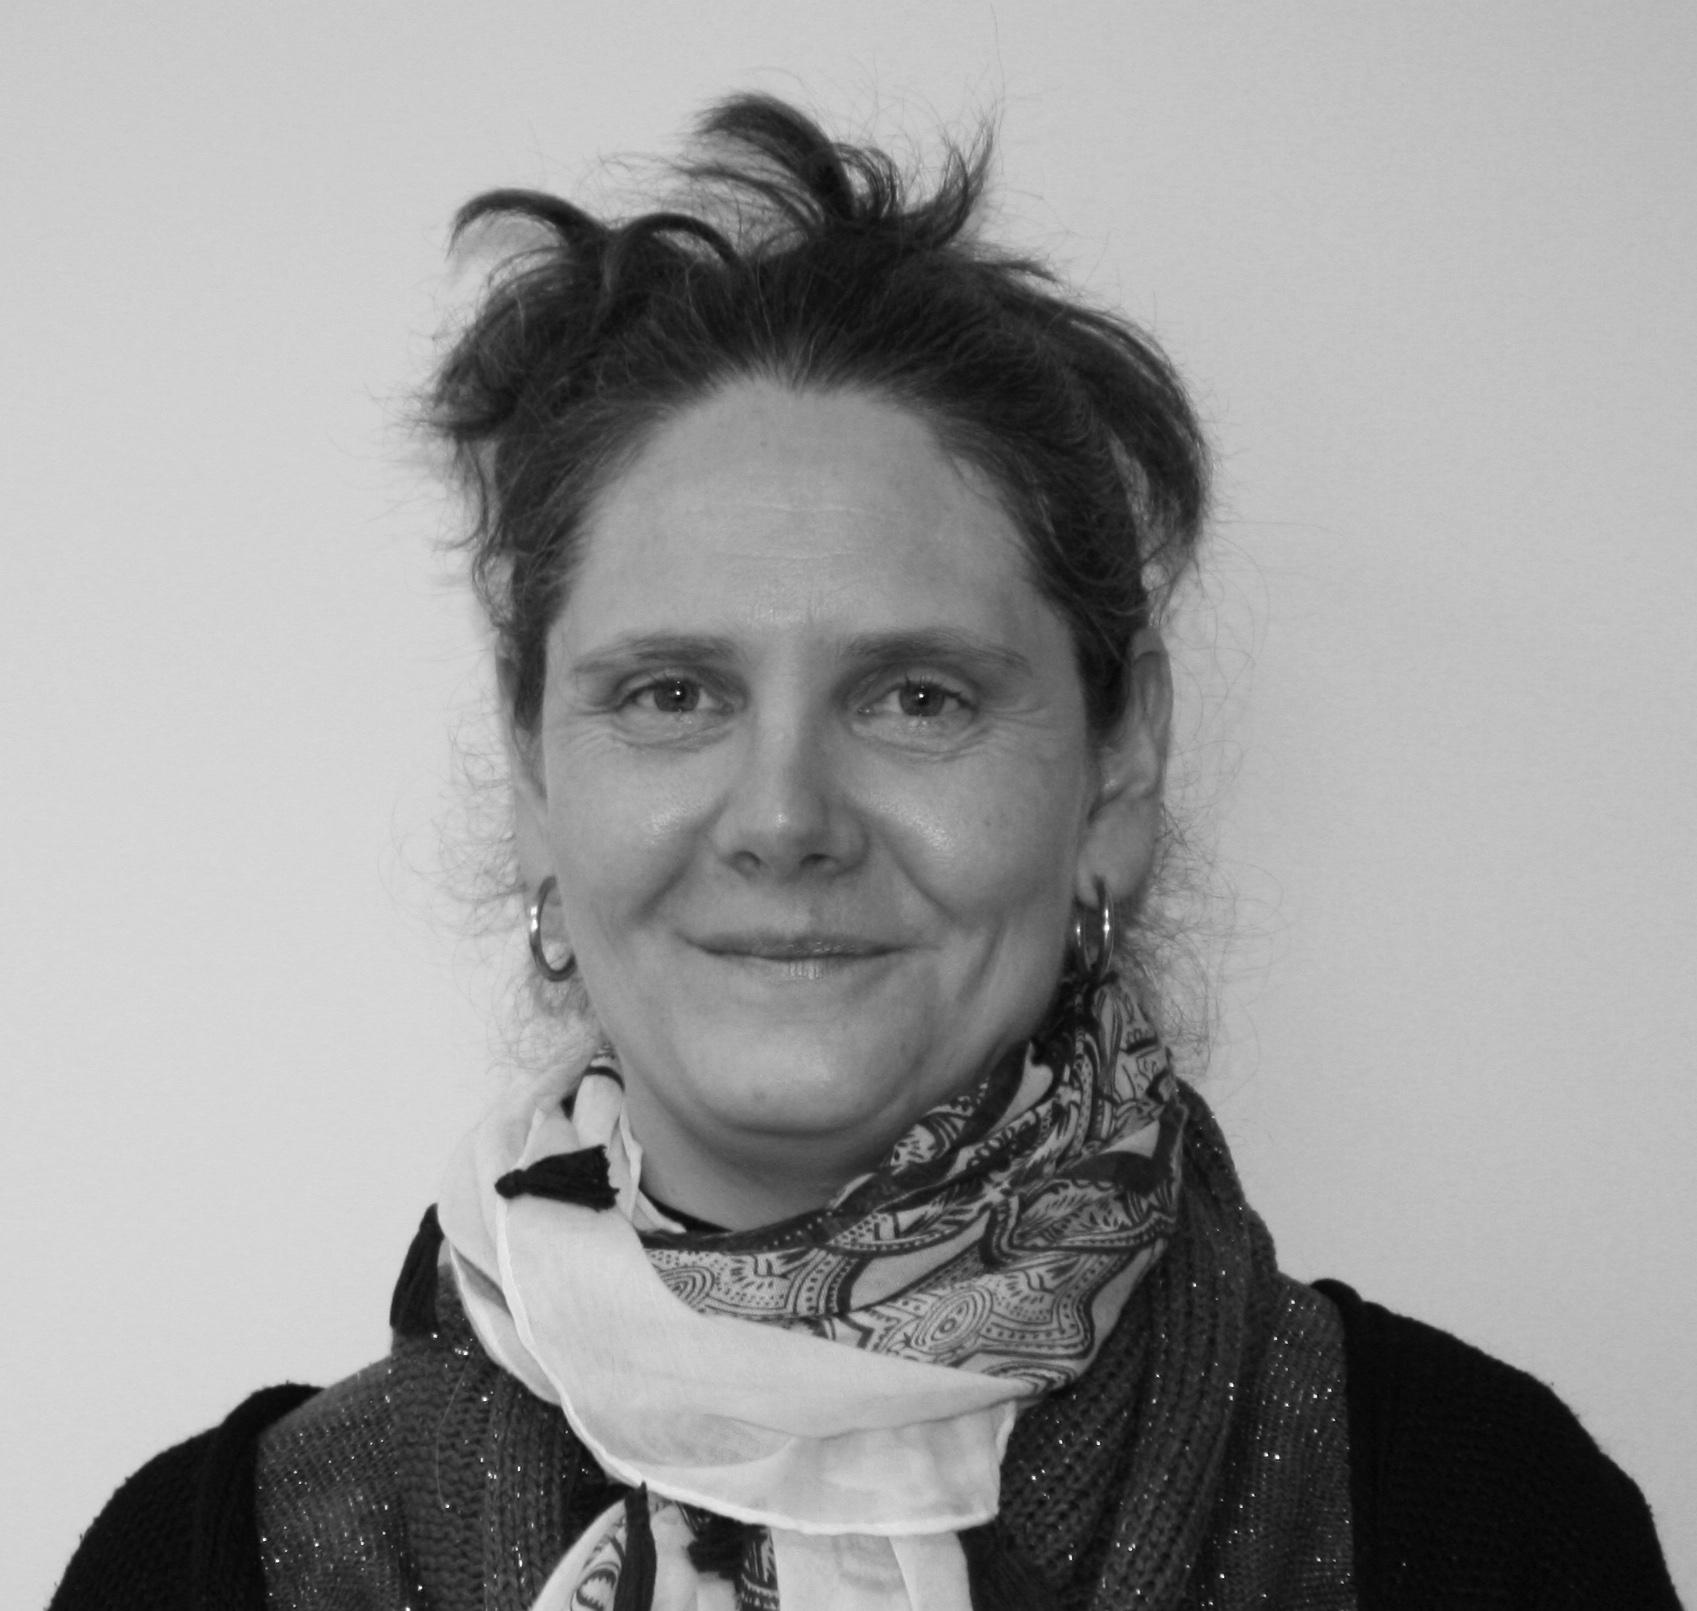 Adélaïde Coscat